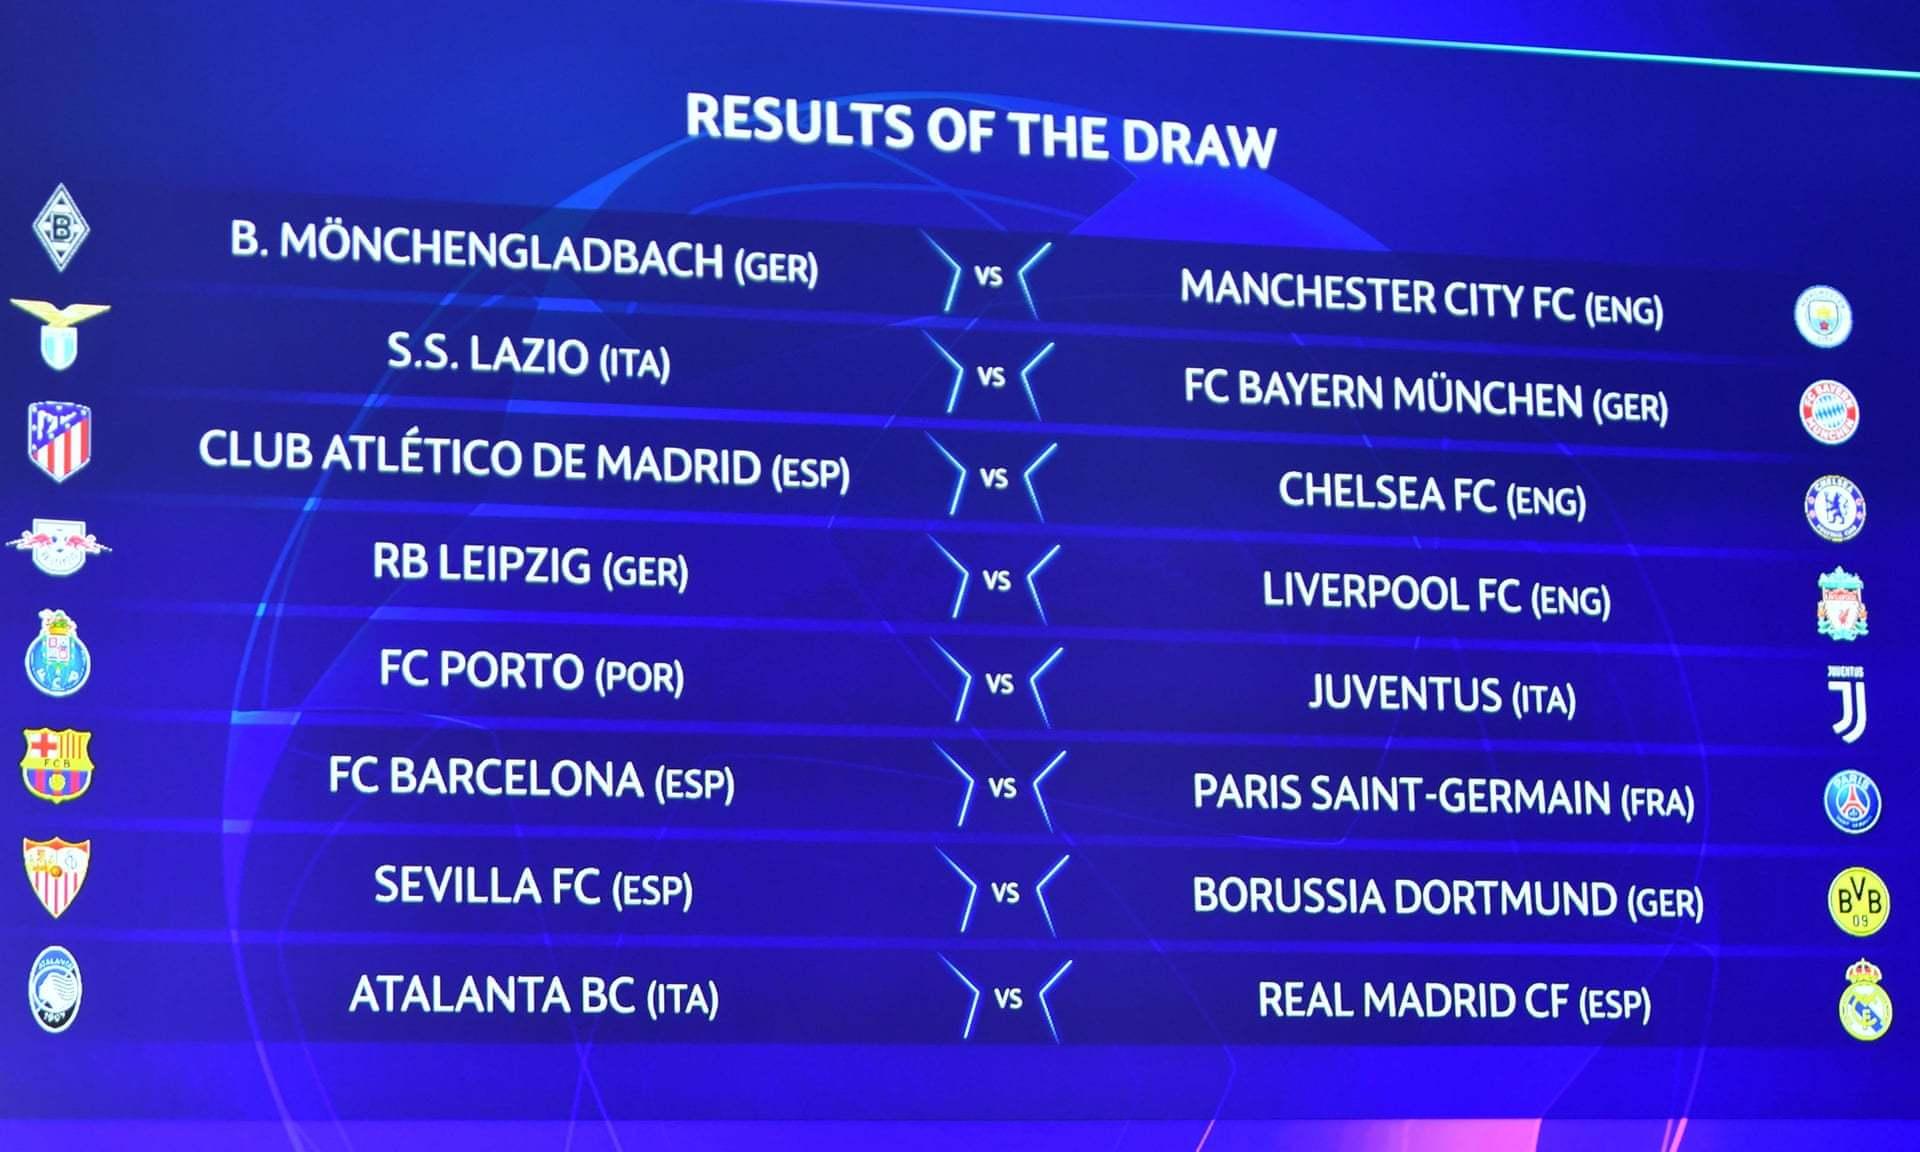 Barcelona,Real Madrid,Bayern Munich,Liverpool,Man City